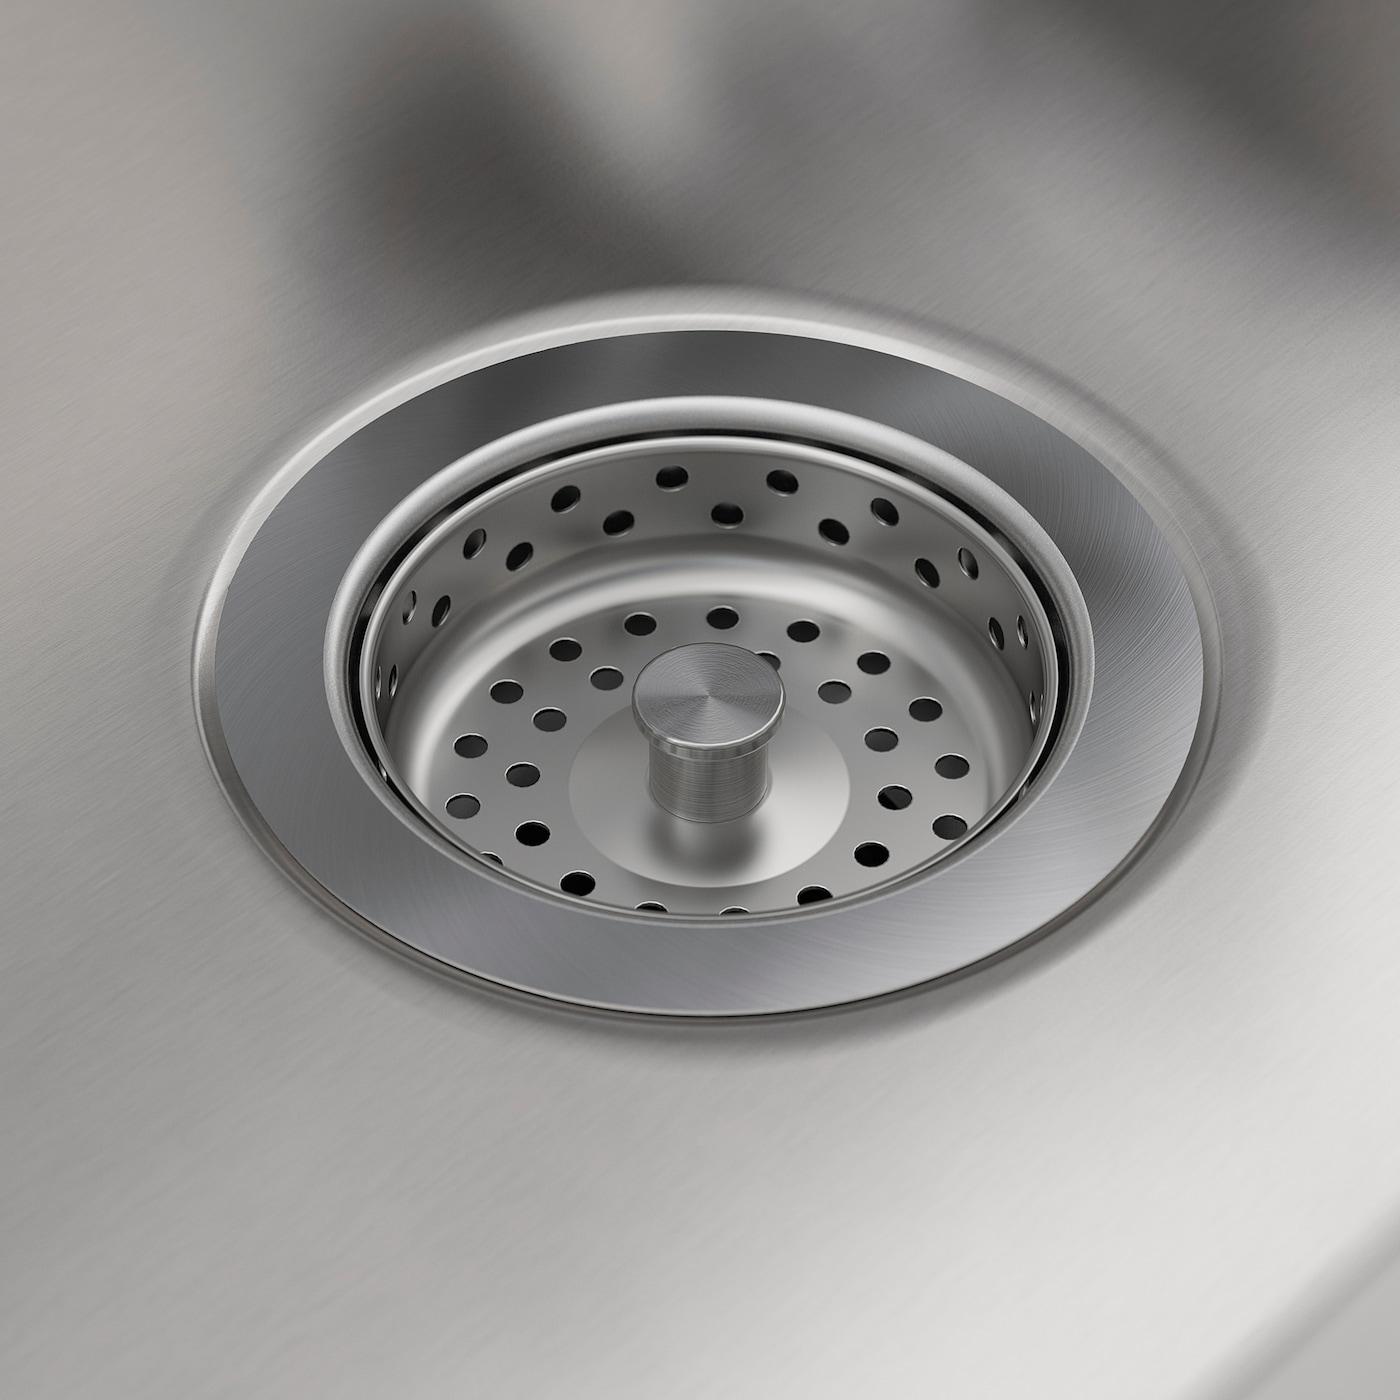 IKEA AMMERÅN Einbauspüle 1 Becken Spülbecken Küchenspüle Waschbecken Siphon NEU